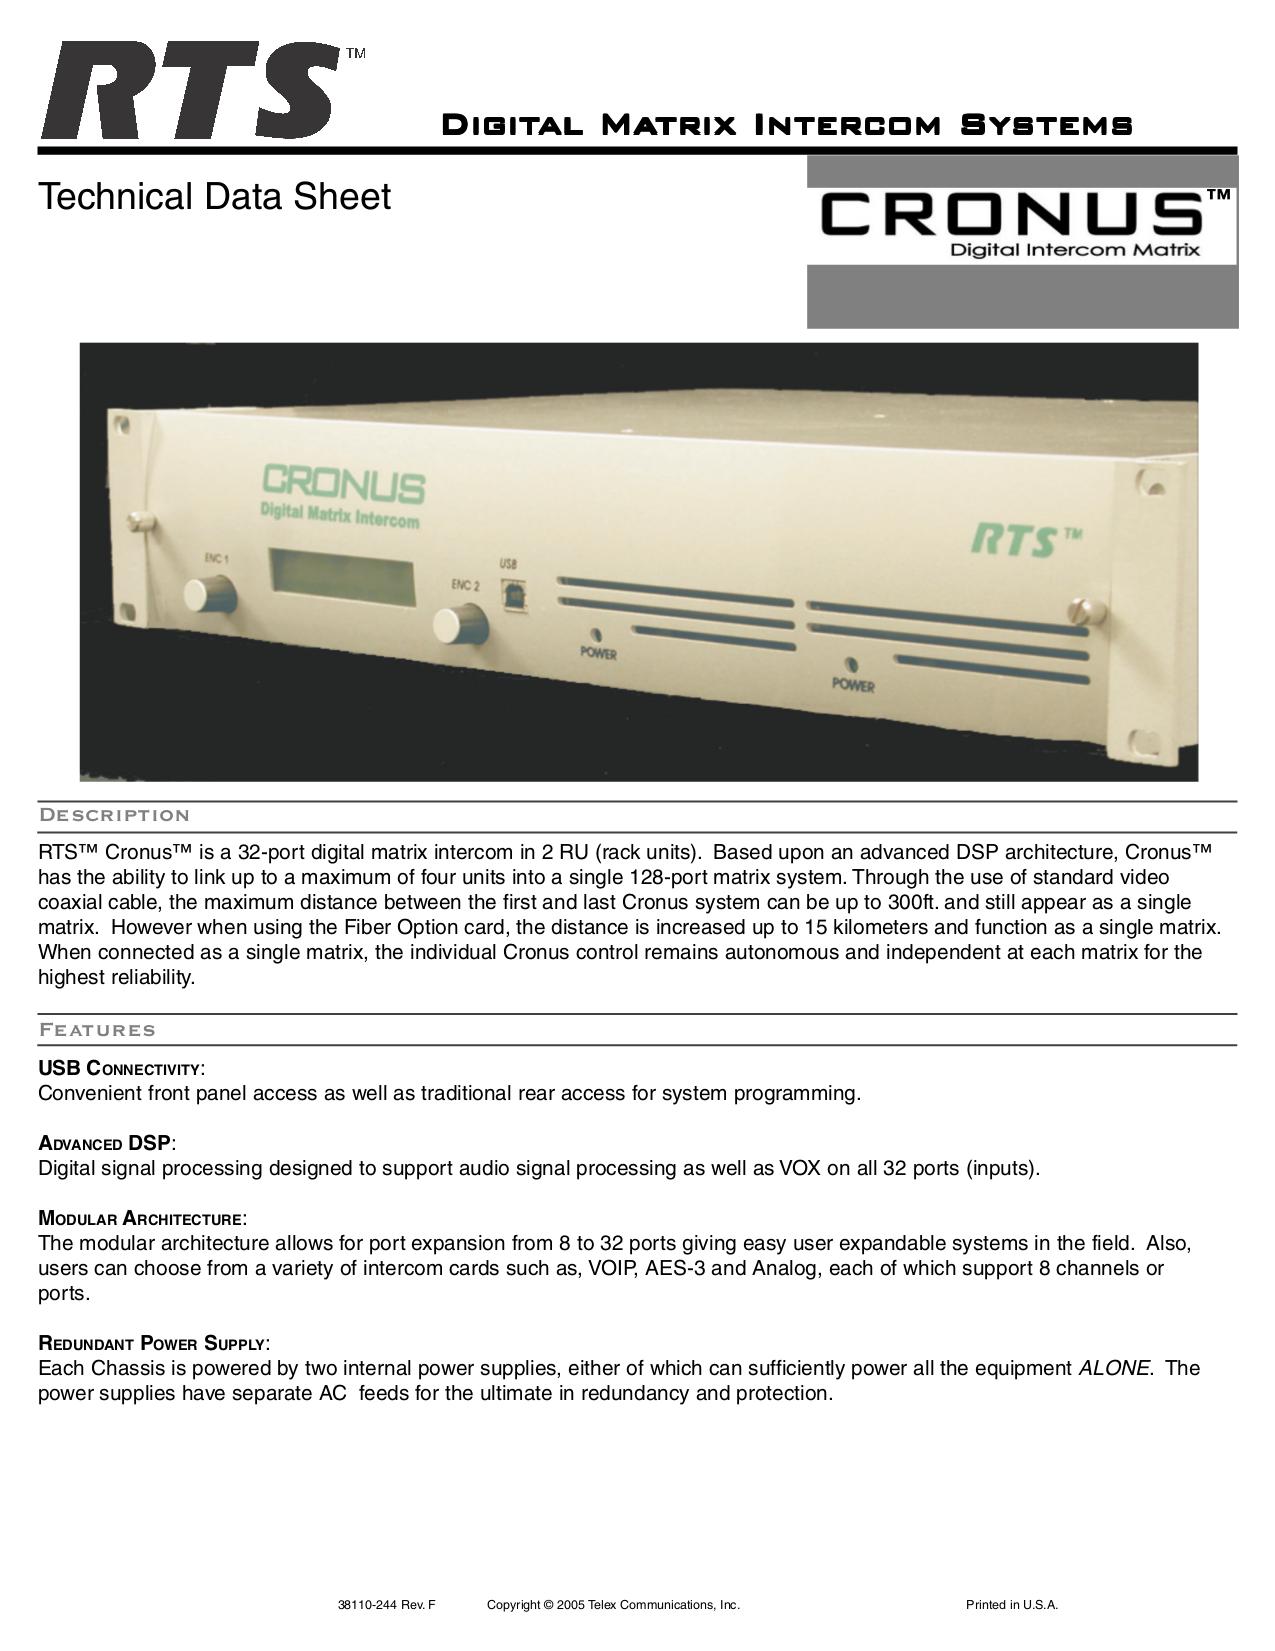 pdf for Telex Other XCP-32-DB9 IntercomSystem manual